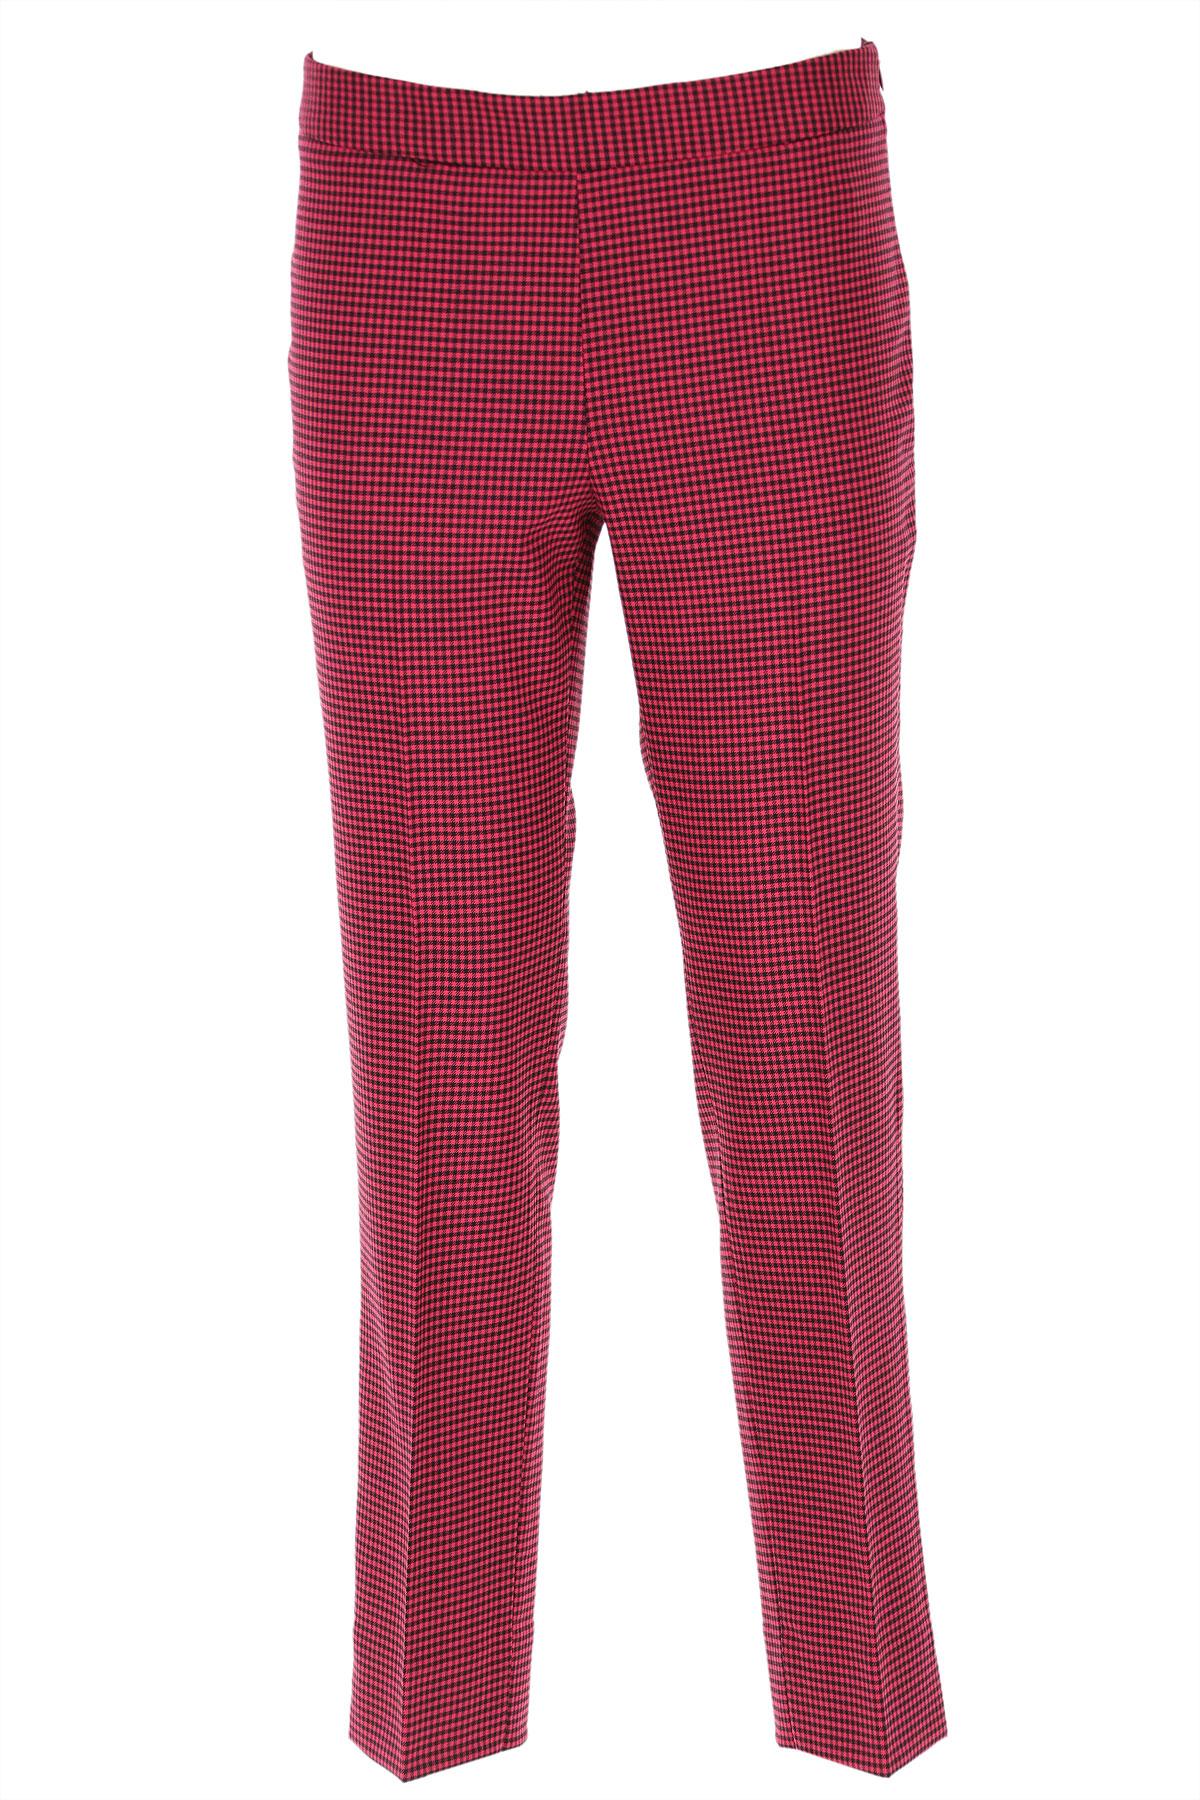 Alberto Biani Pants for Women On Sale, Fuchsia, Wool, 2019, 26